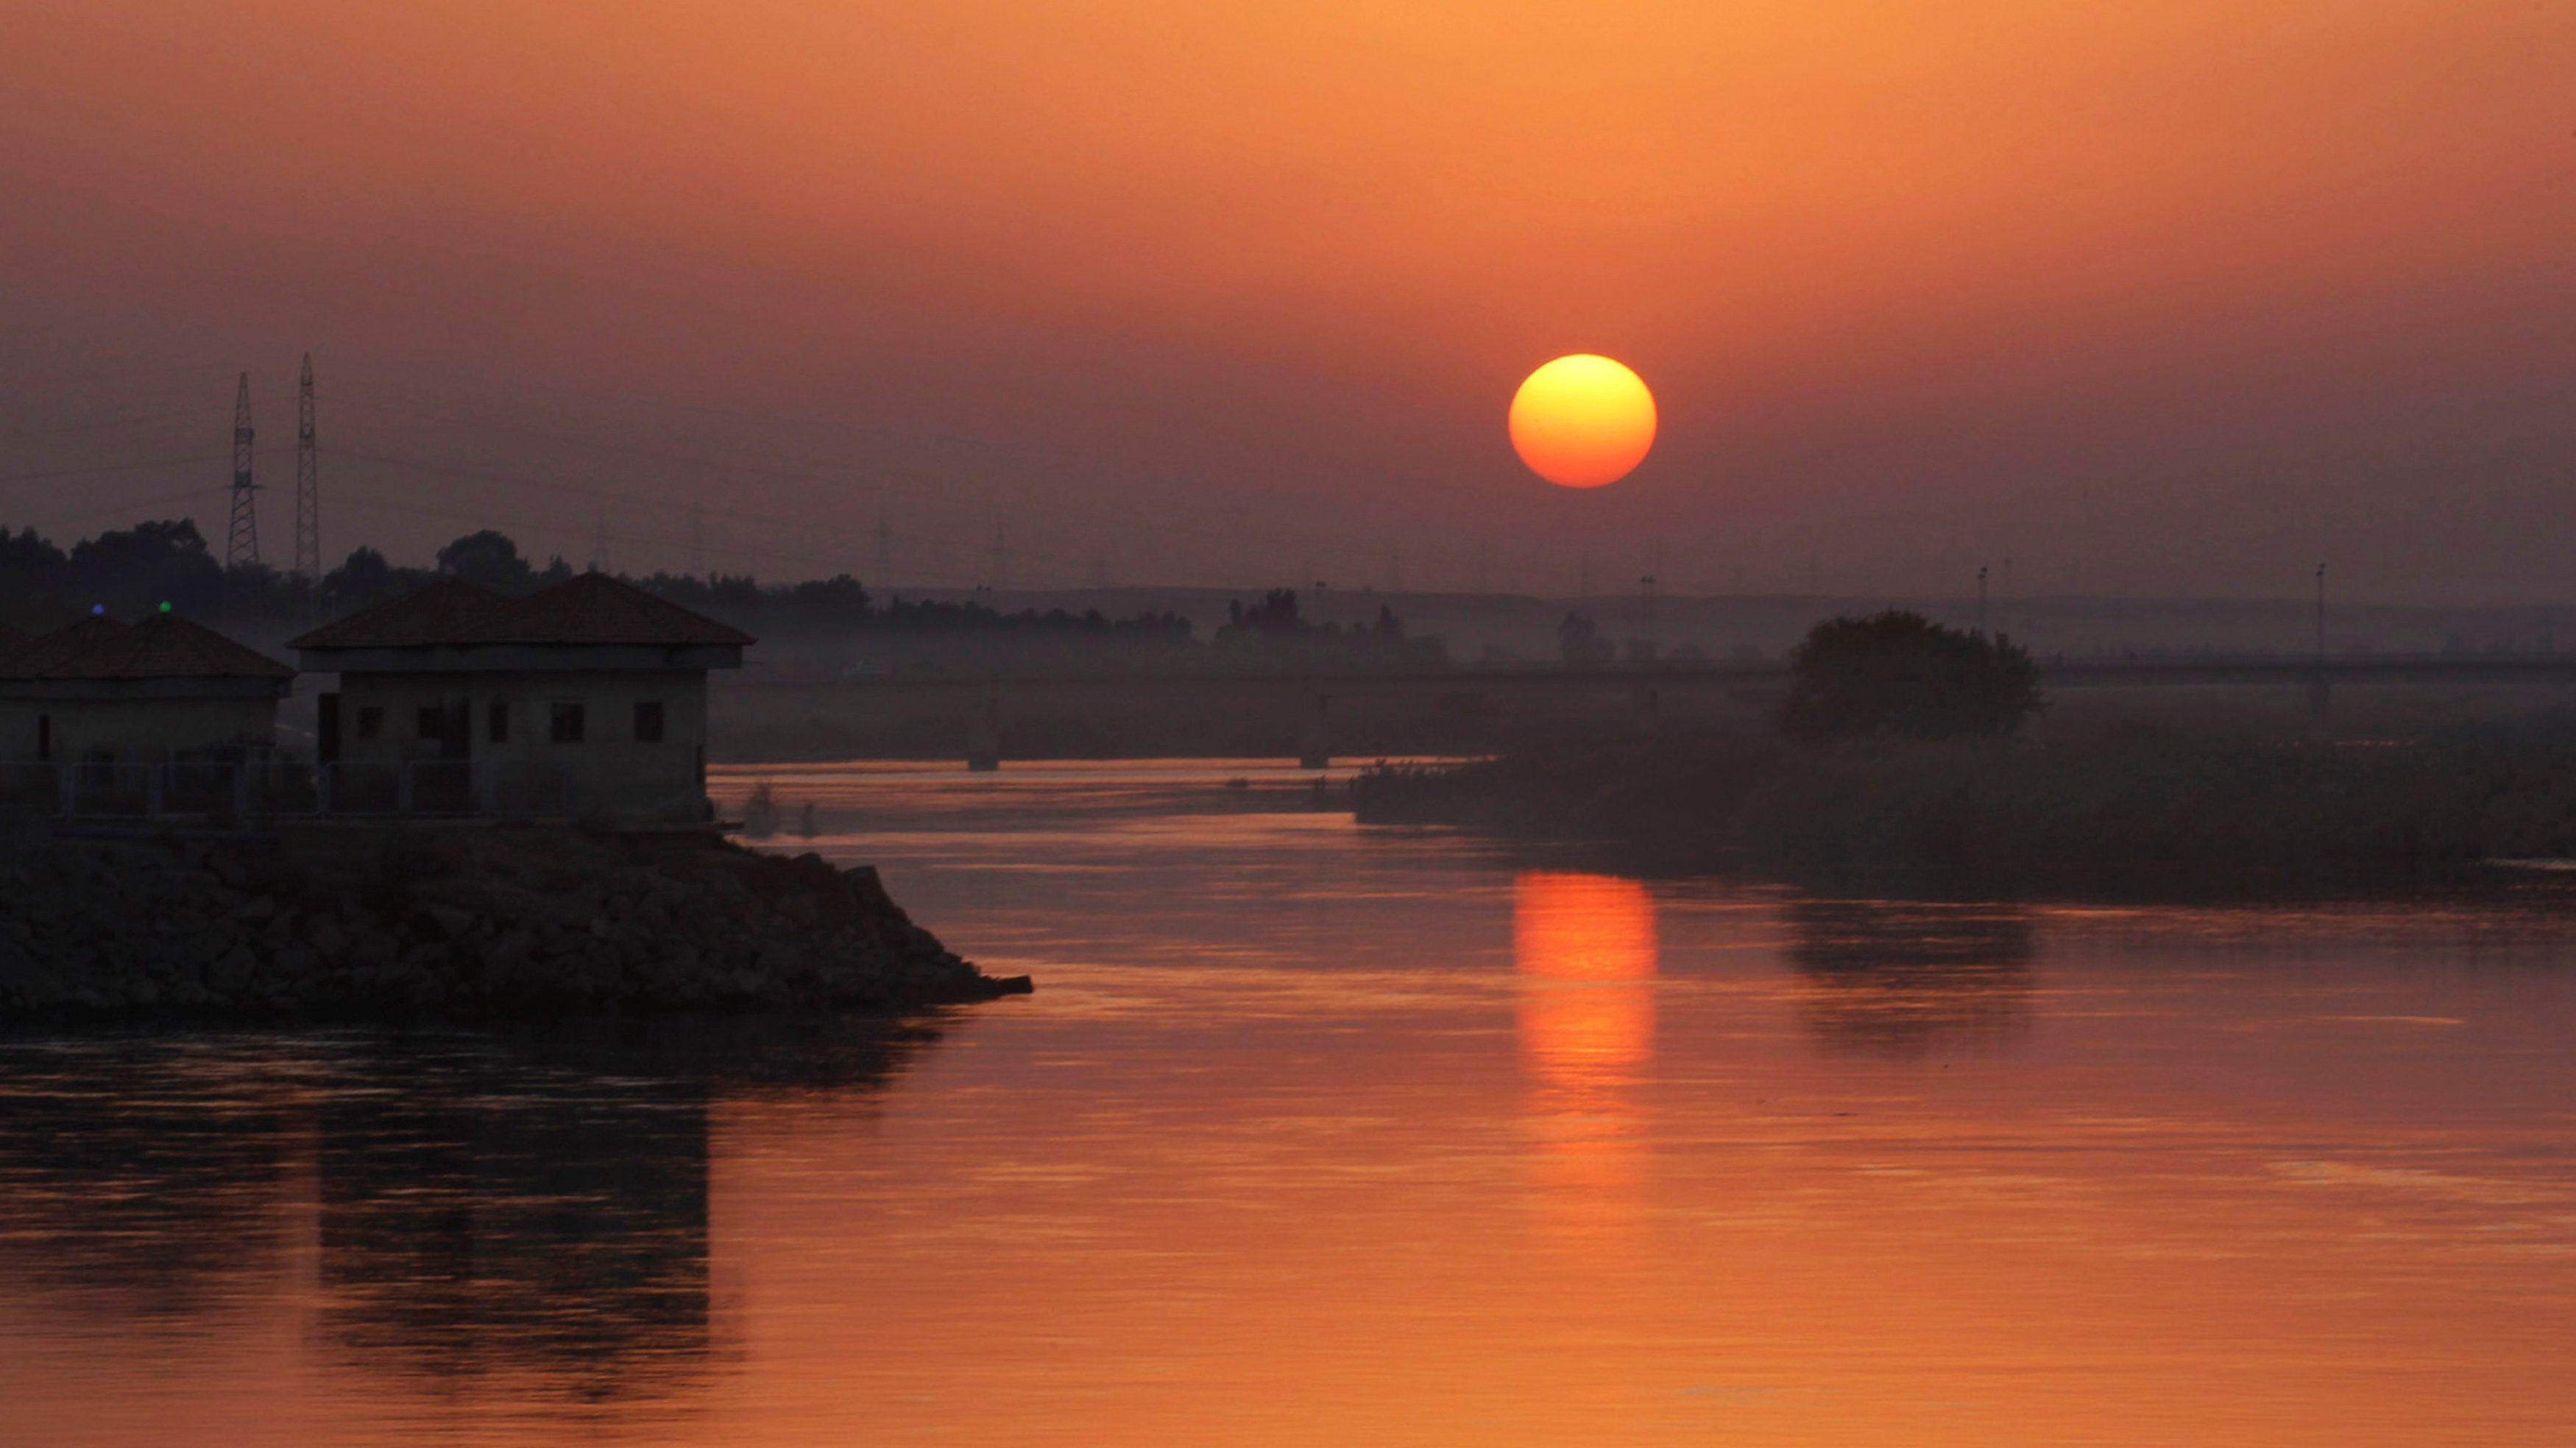 The sun sets over the Euphrates river in Raqqa.